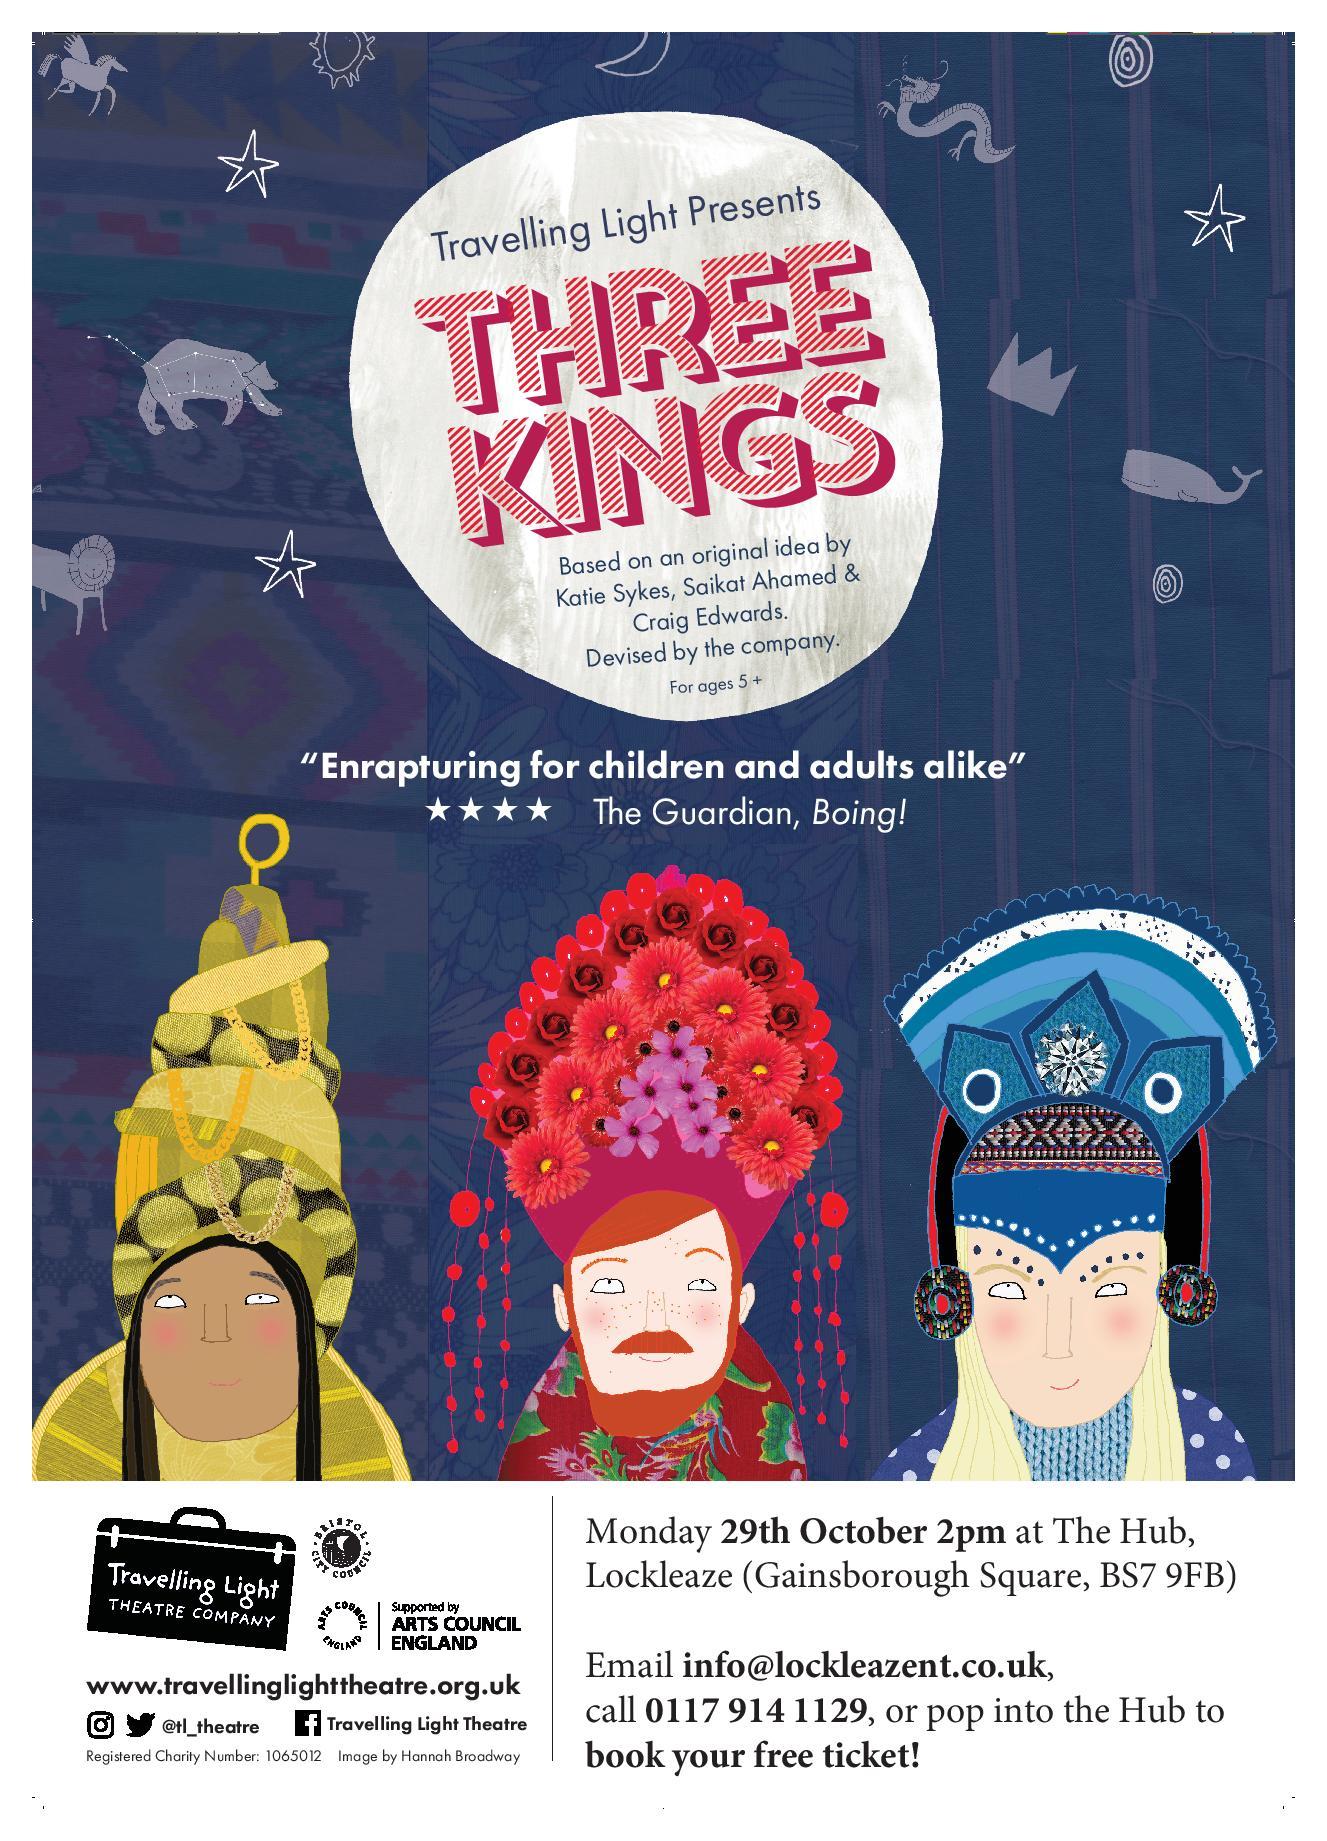 3 kings poster Lockleaze no margins-page-001.jpg